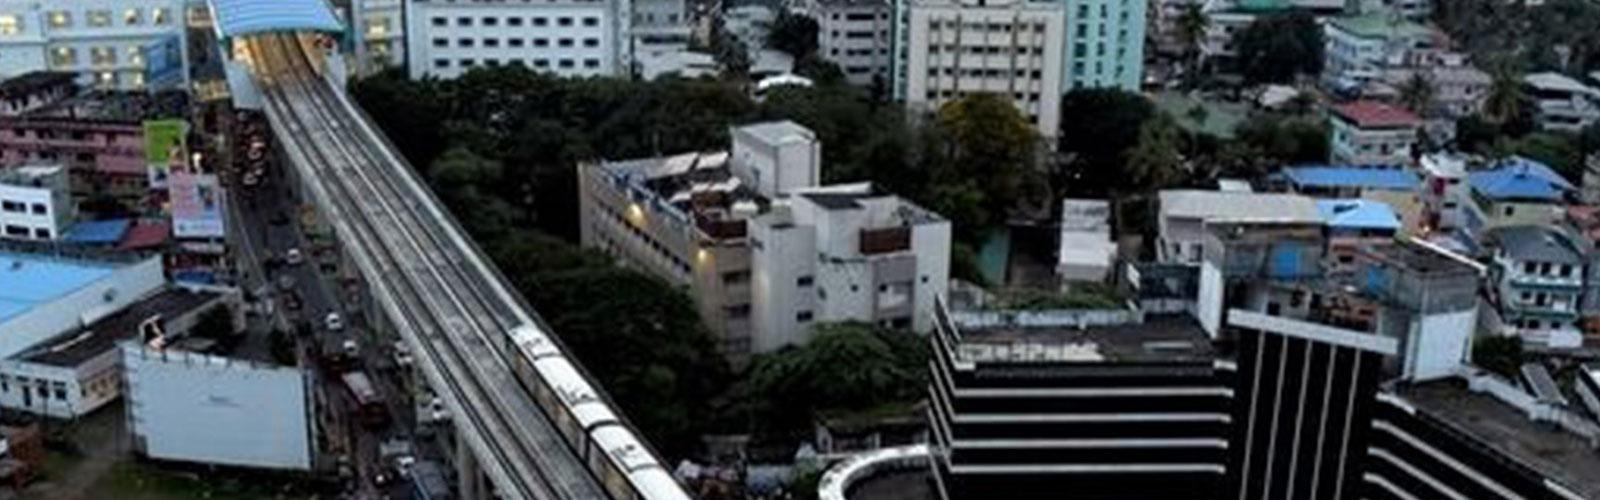 Urban-governance